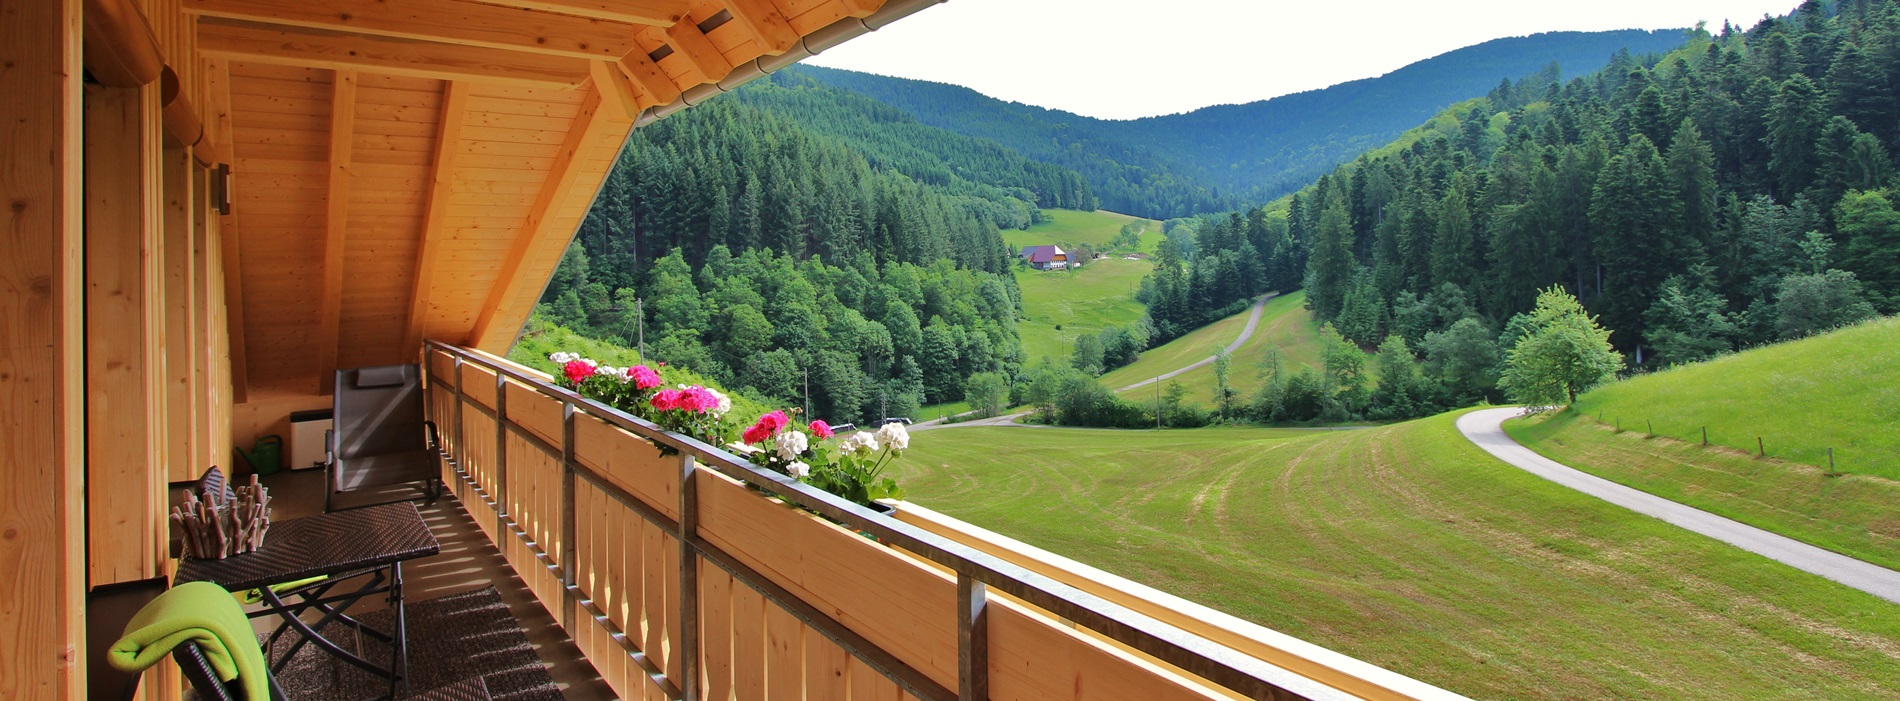 Balkon Stinneshof Oberharmesbach